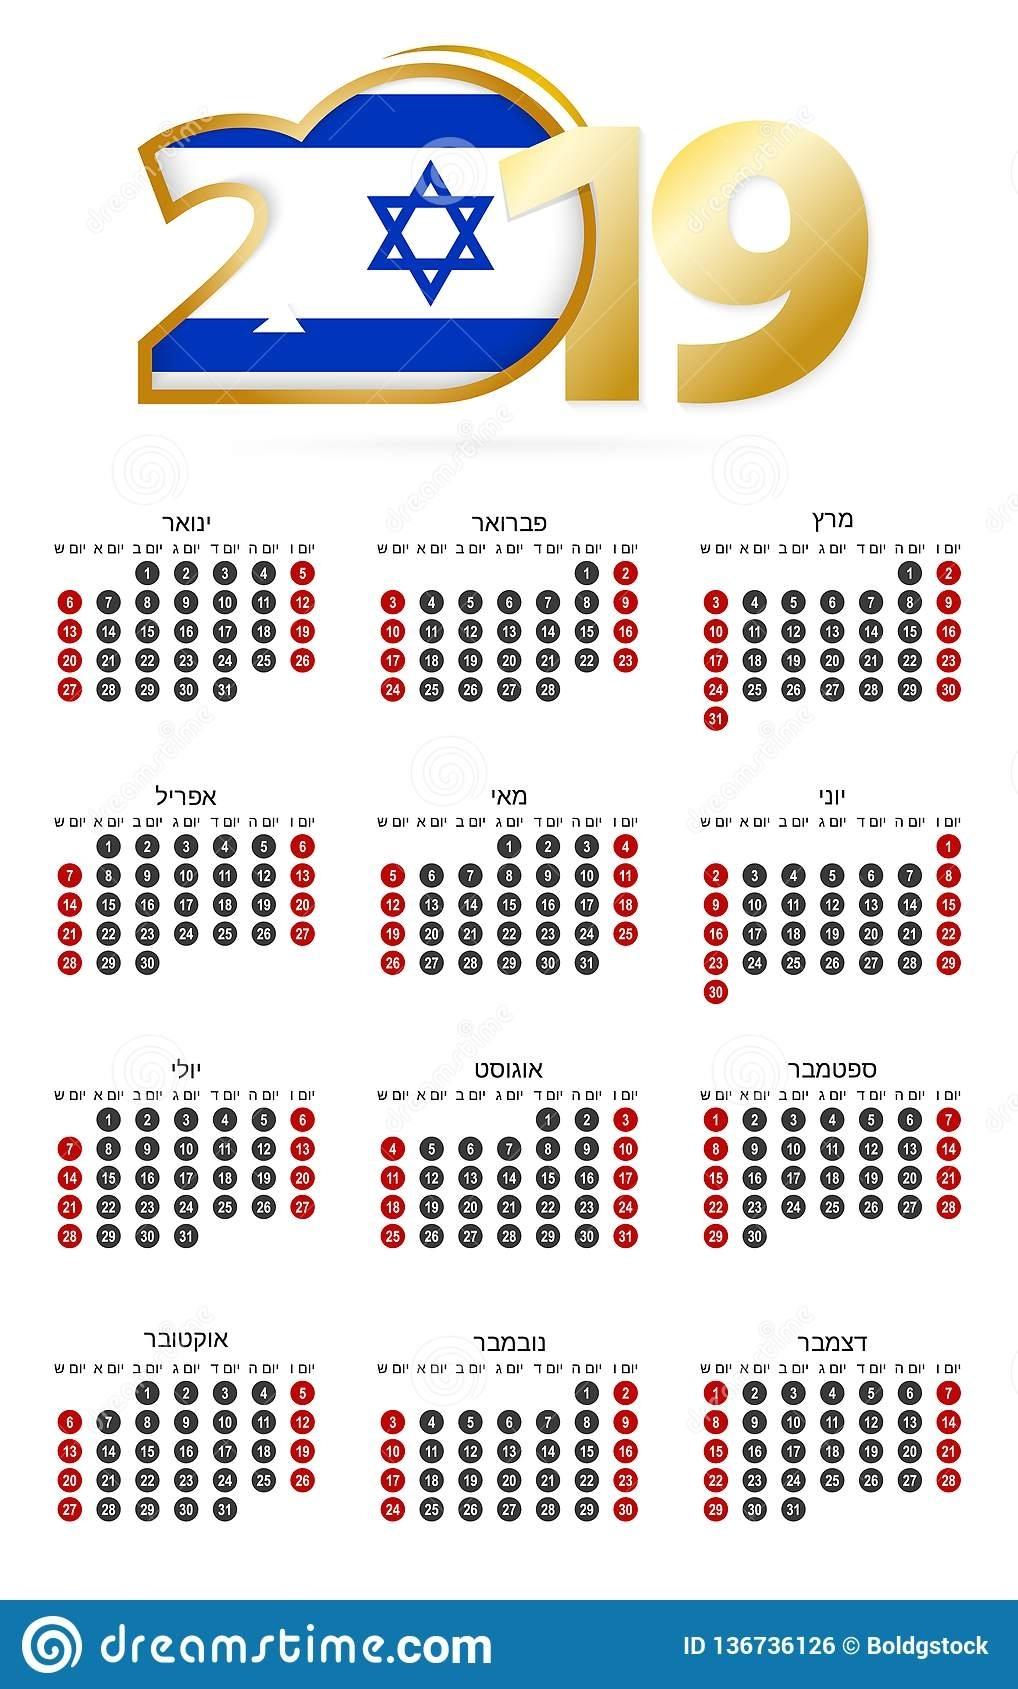 Hebrew Calendar 2019 With Numbers In Circles, Week Starts On Sunday regarding Ewish Calendar 2019 - 2020